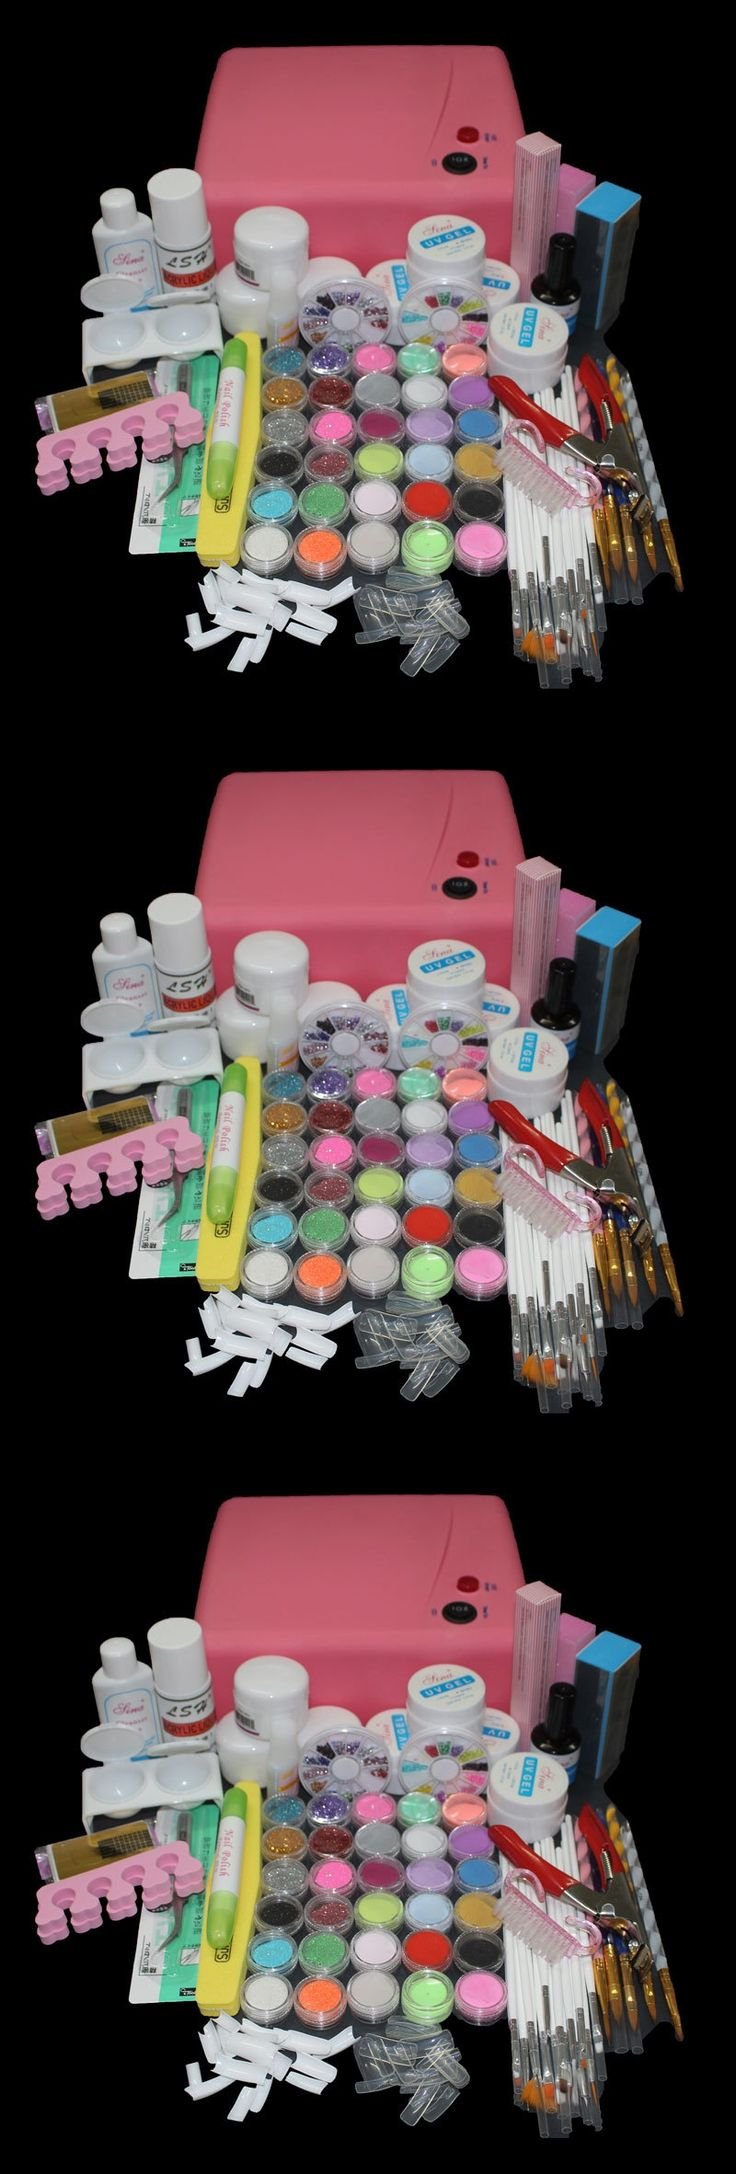 BTT-116    free shipping Pro 36W UV Dryer acrylic nail art set ,acrylic nail kit ,kit nail gel ,kit  Gel nails set with lamp